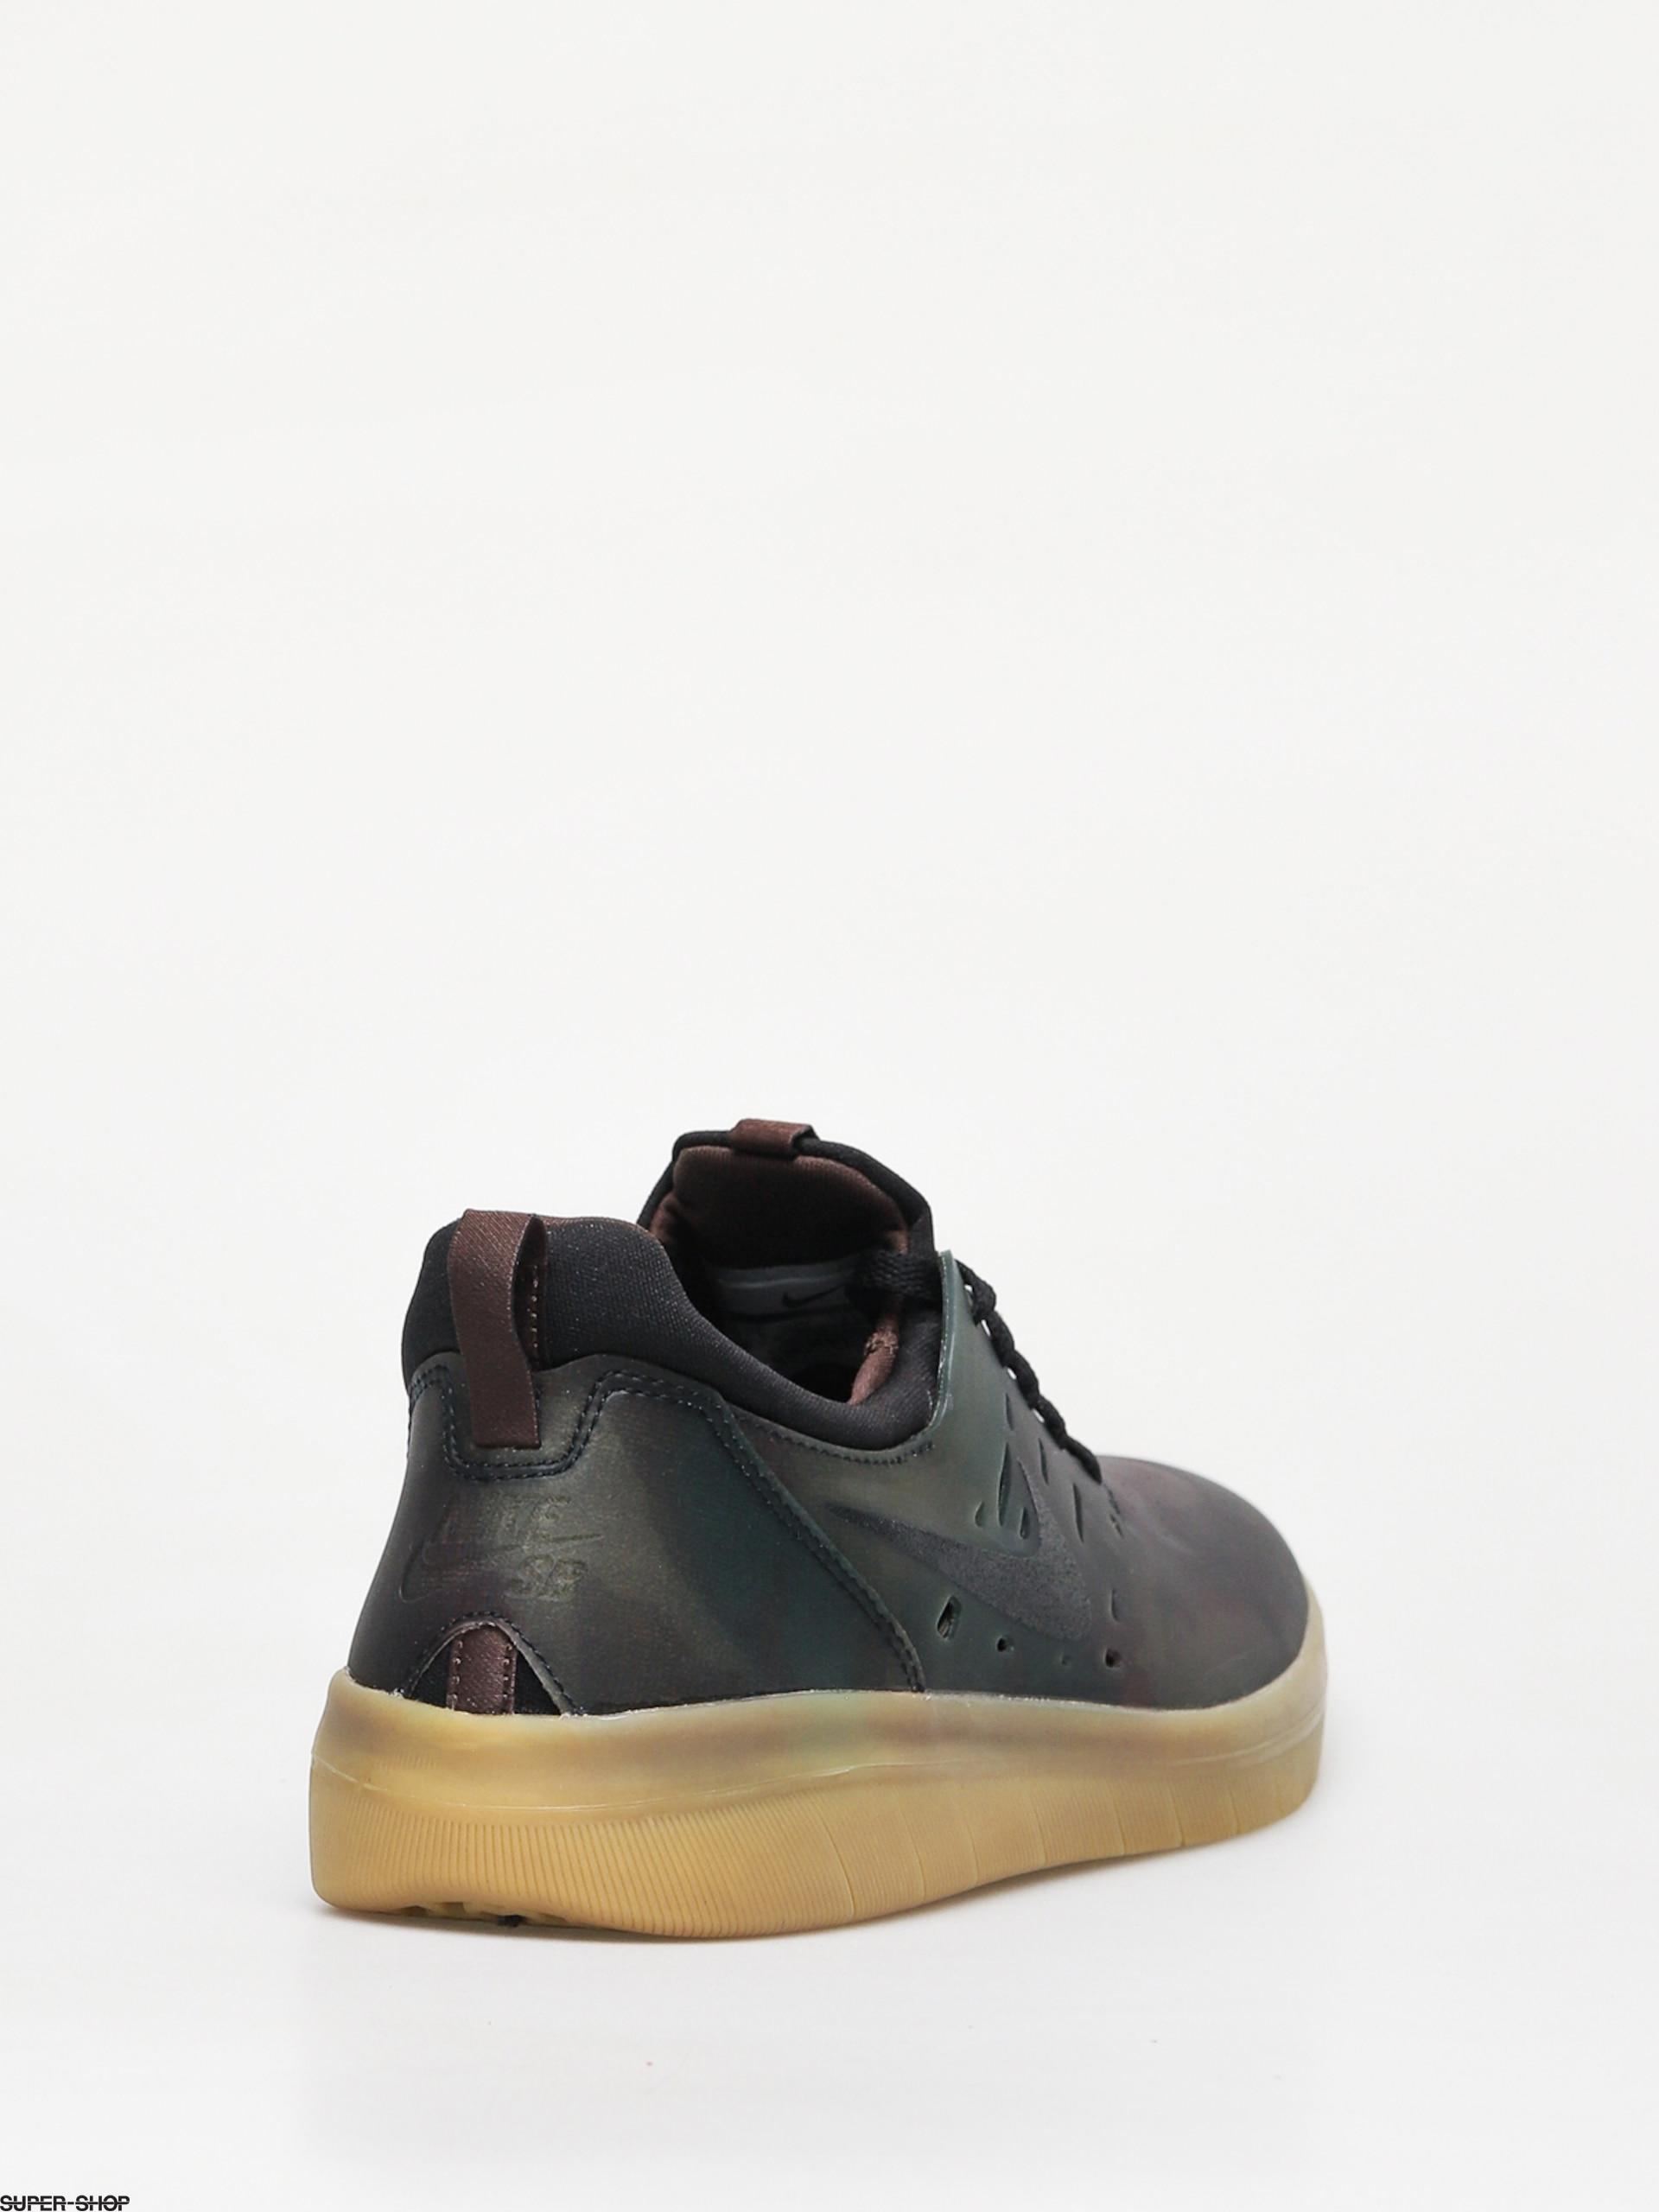 03be5c089a07 Nike SB Sb Nyjah Free Prm Shoes (multi color black gum light brown)